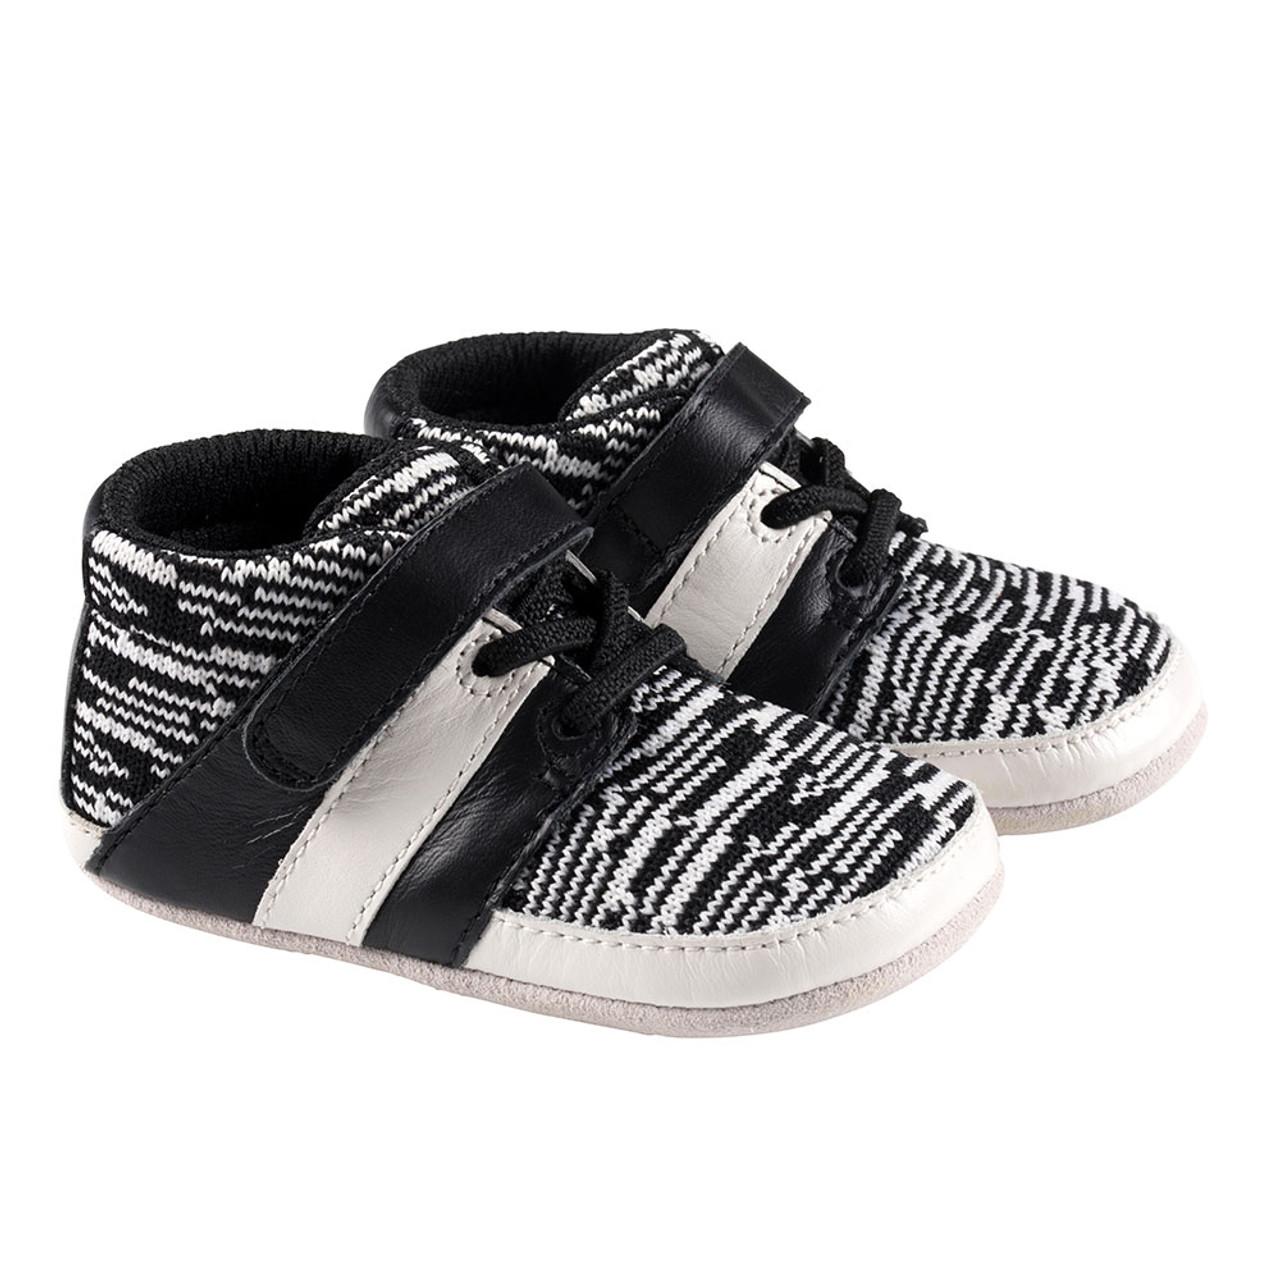 Mason | Mini Shoez | Baby Shoes | Robeez